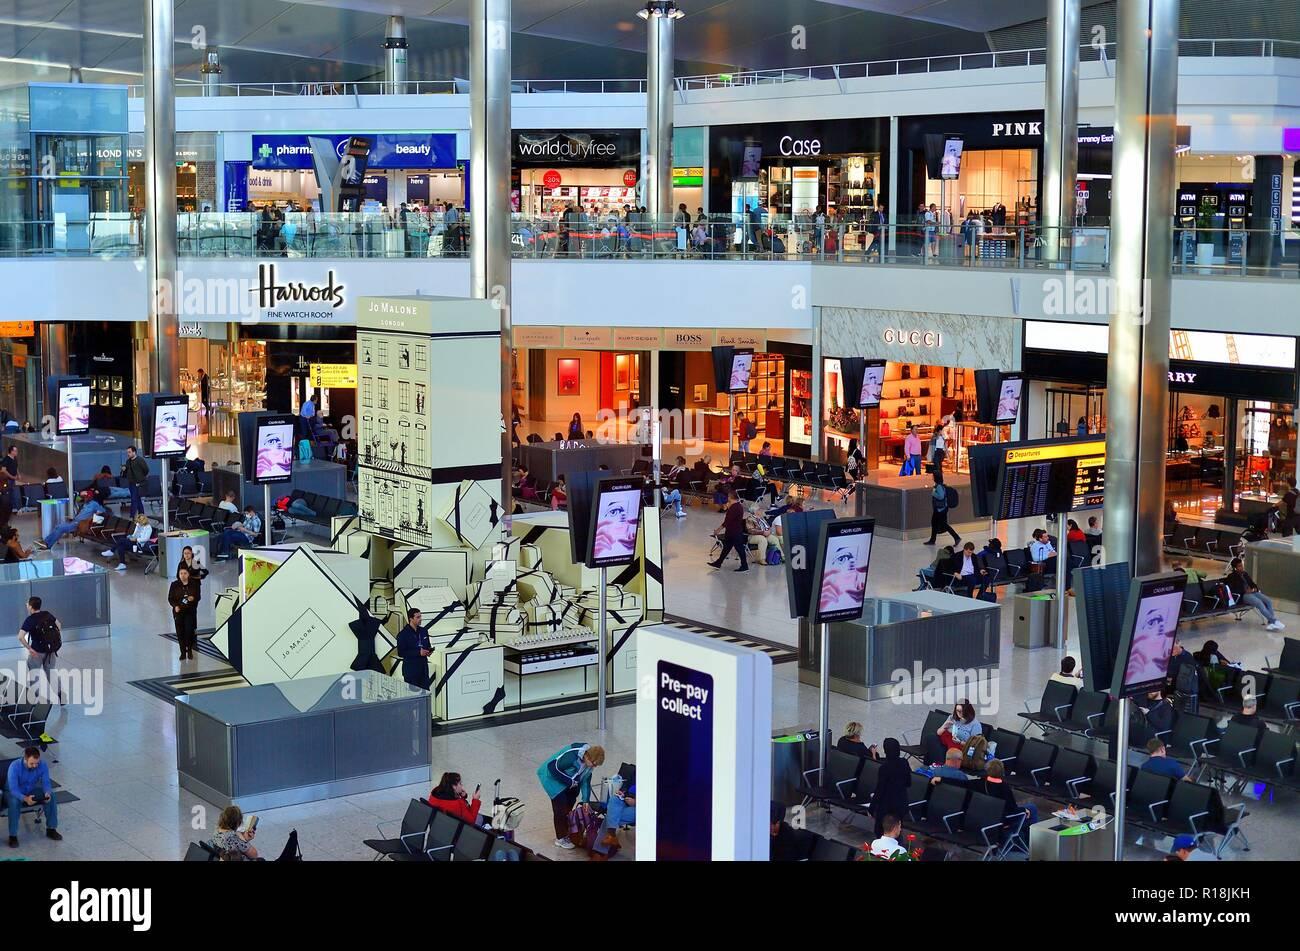 London, England, United Kingdom. International departure lounge along with duty free shops at Heathrow International Airport. - Stock Image